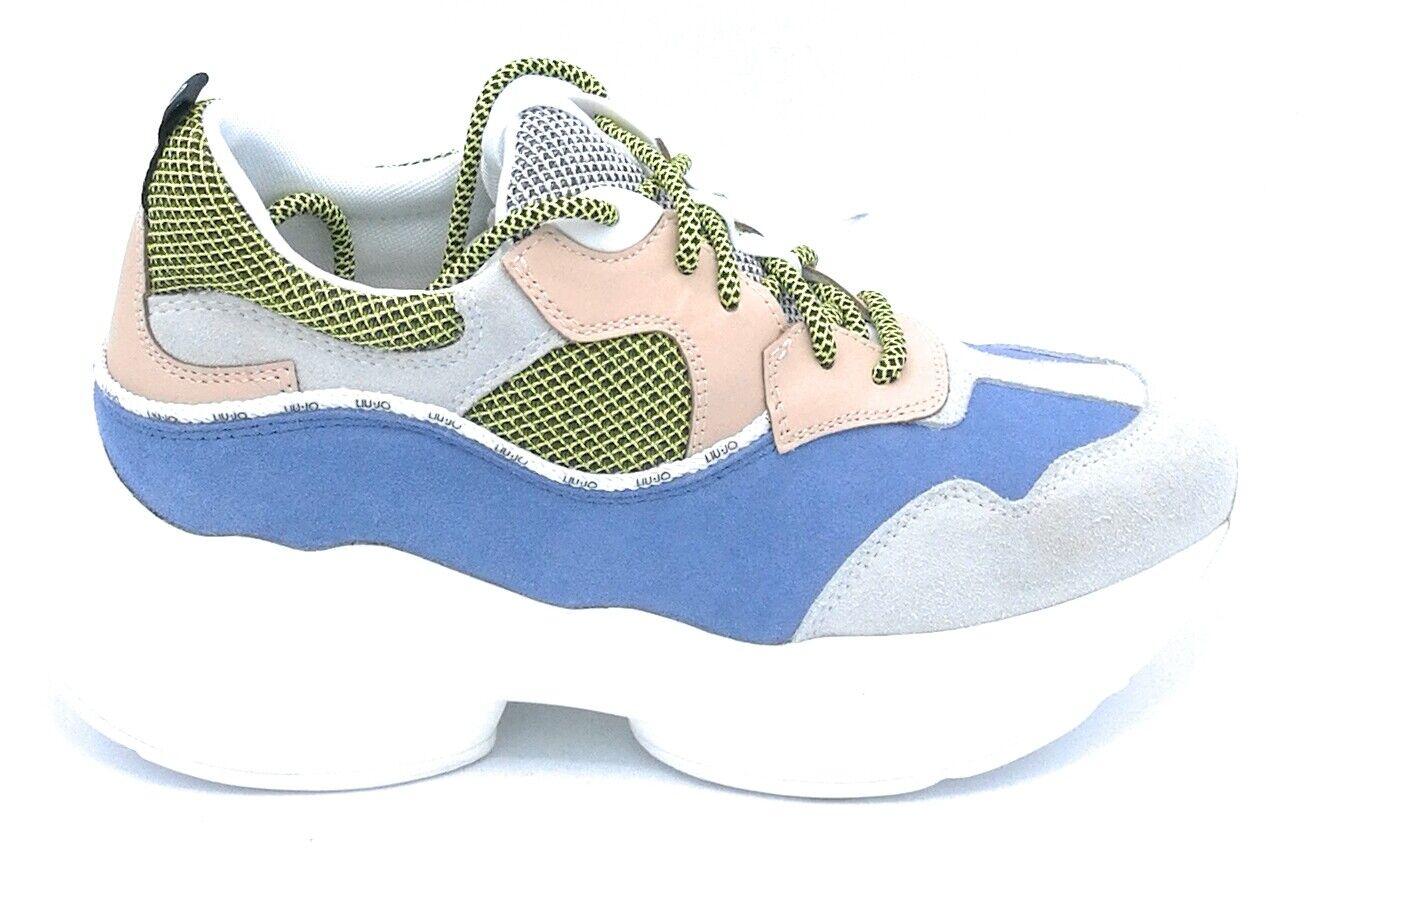 Liu Jo B19035 sneaker laces suede multicolour